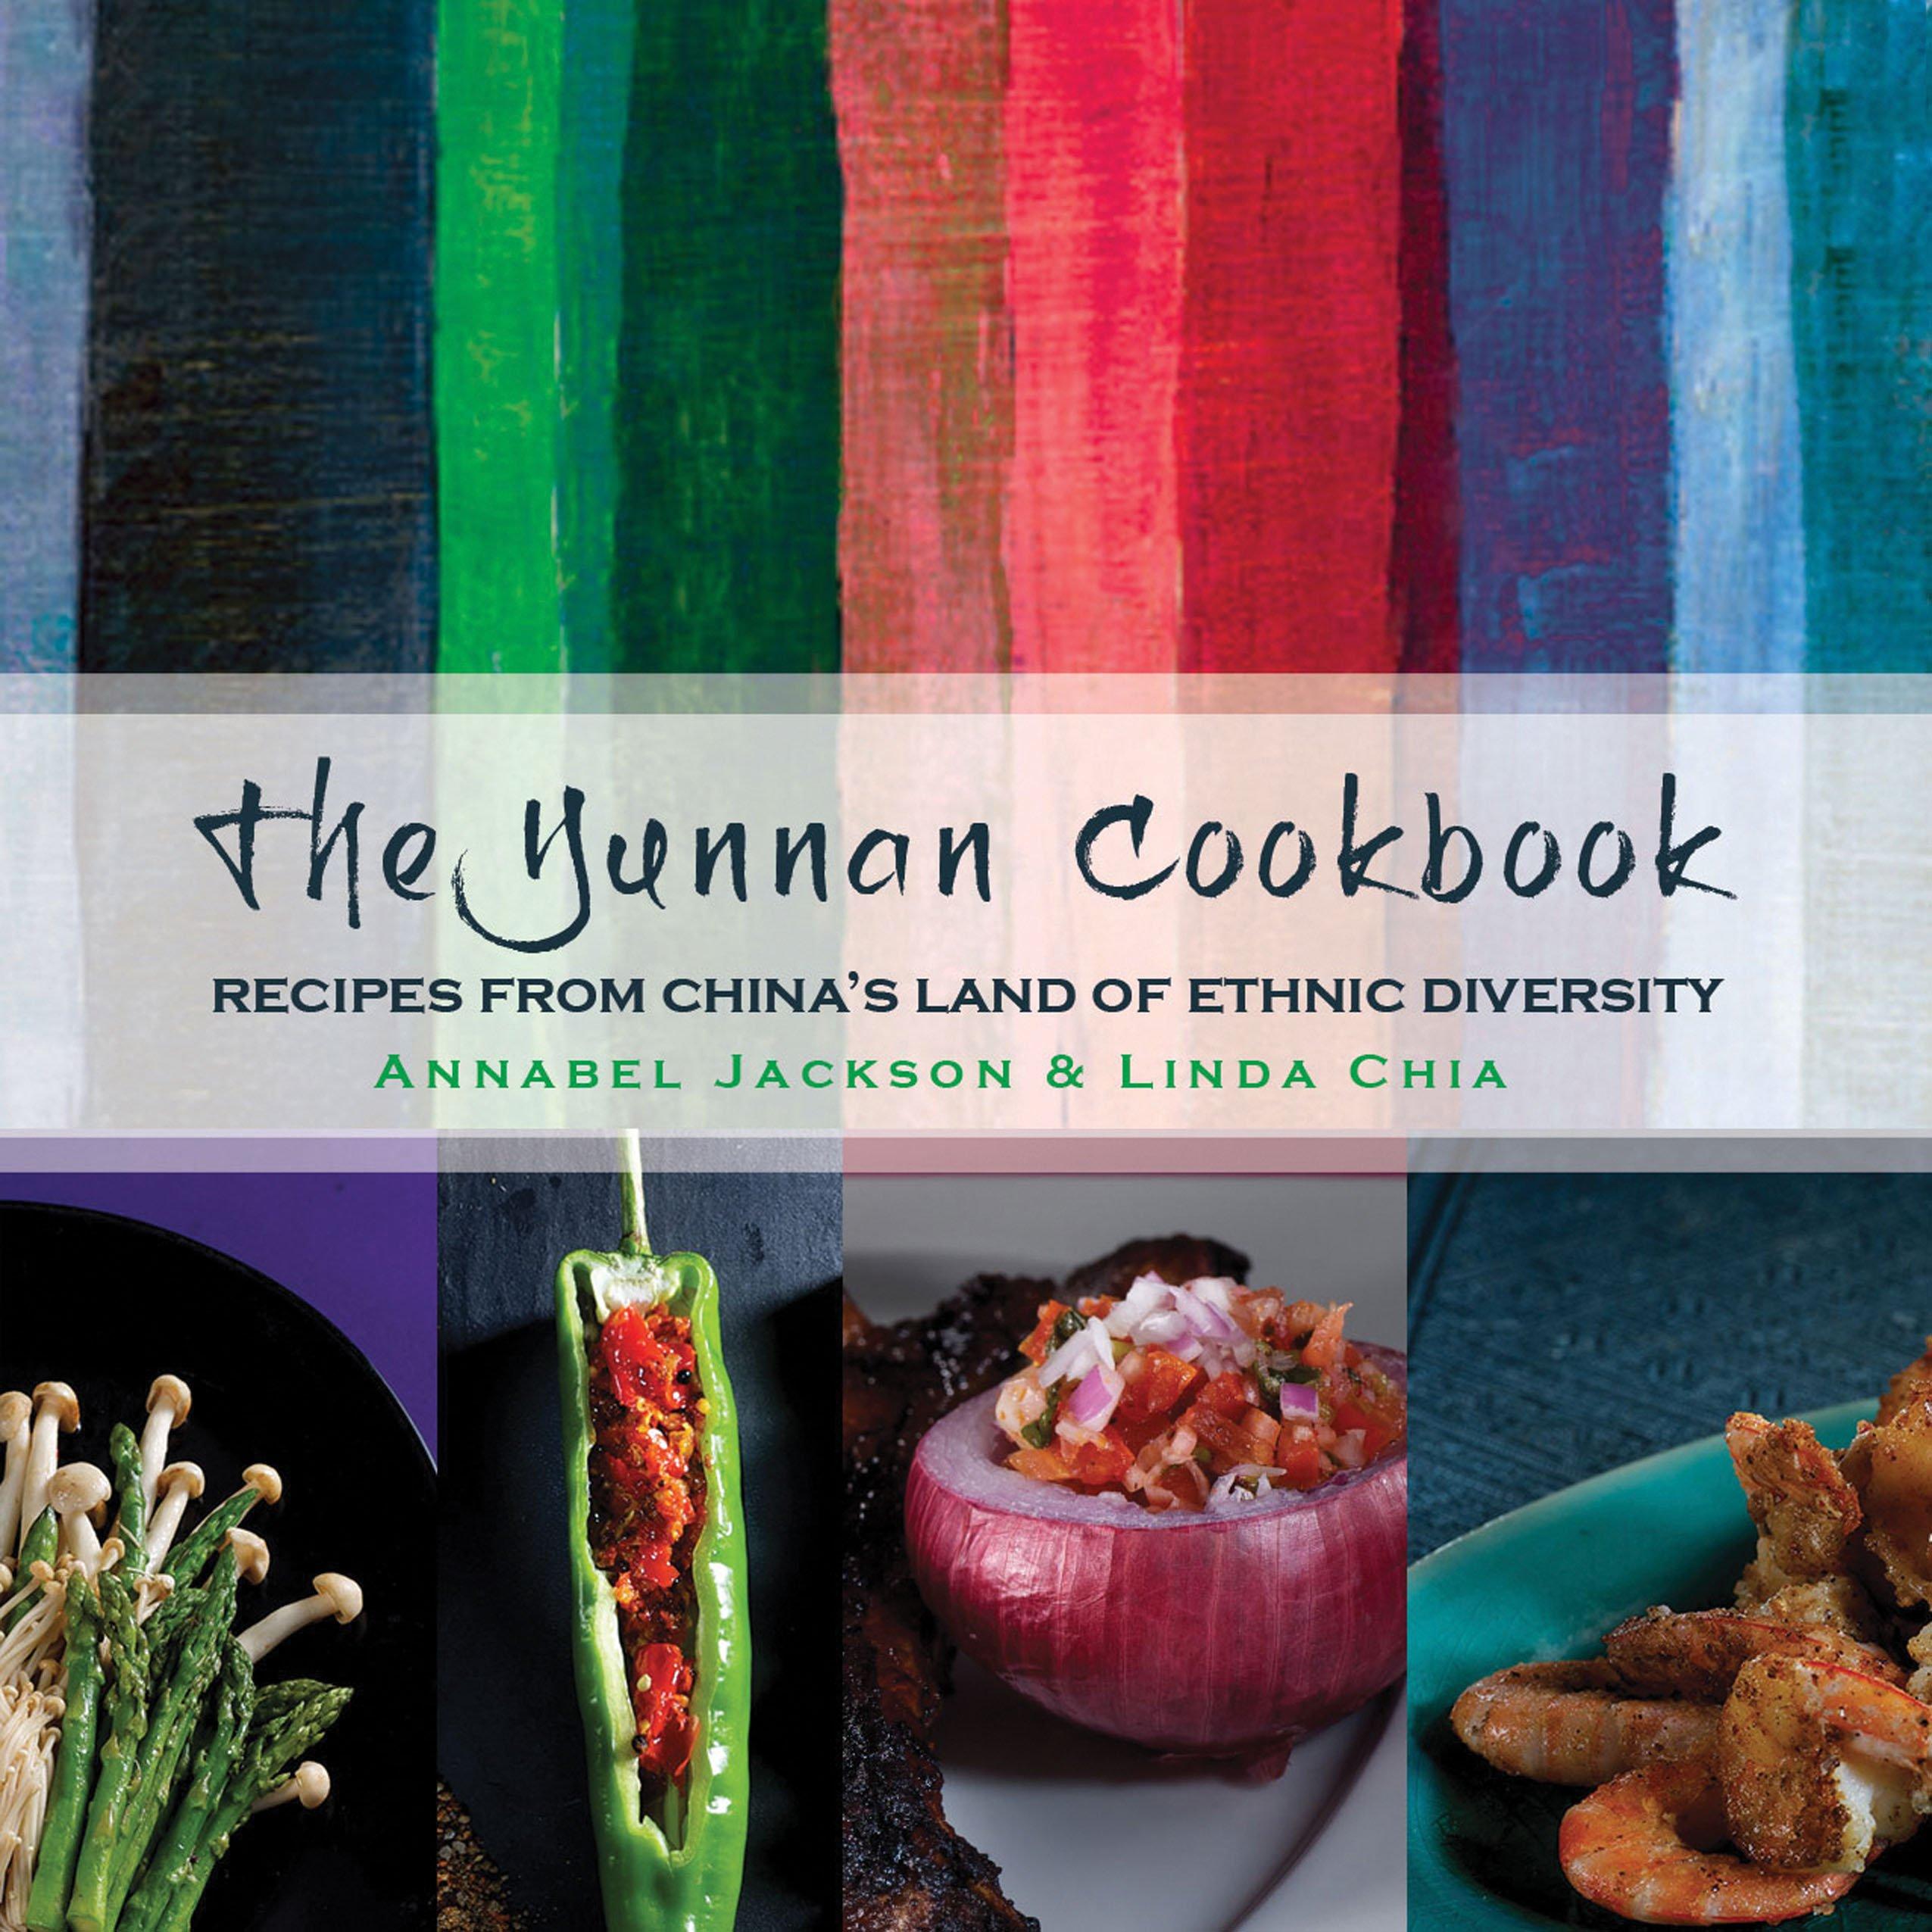 The Yunnan Cookbook: Amazon.de: Jackson, Annabel, Chia, Linda